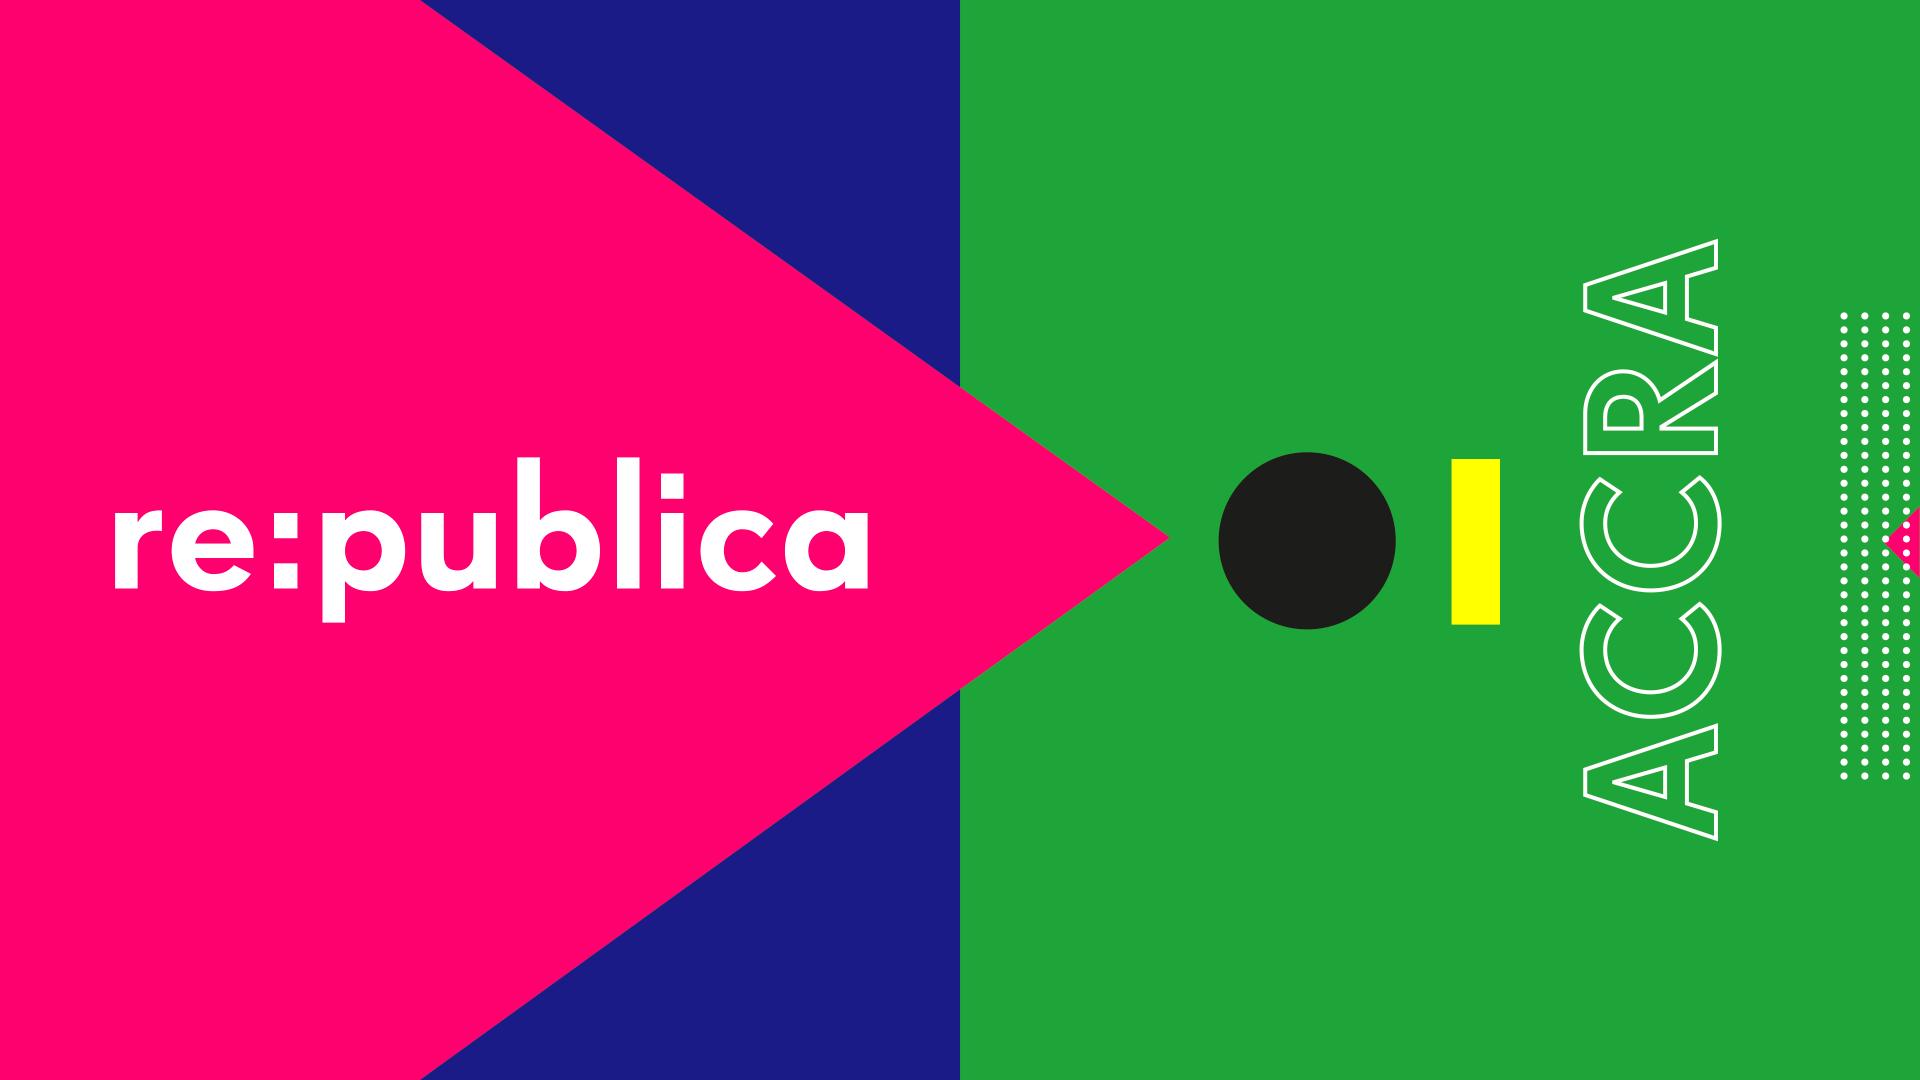 re:publica Accra 2018